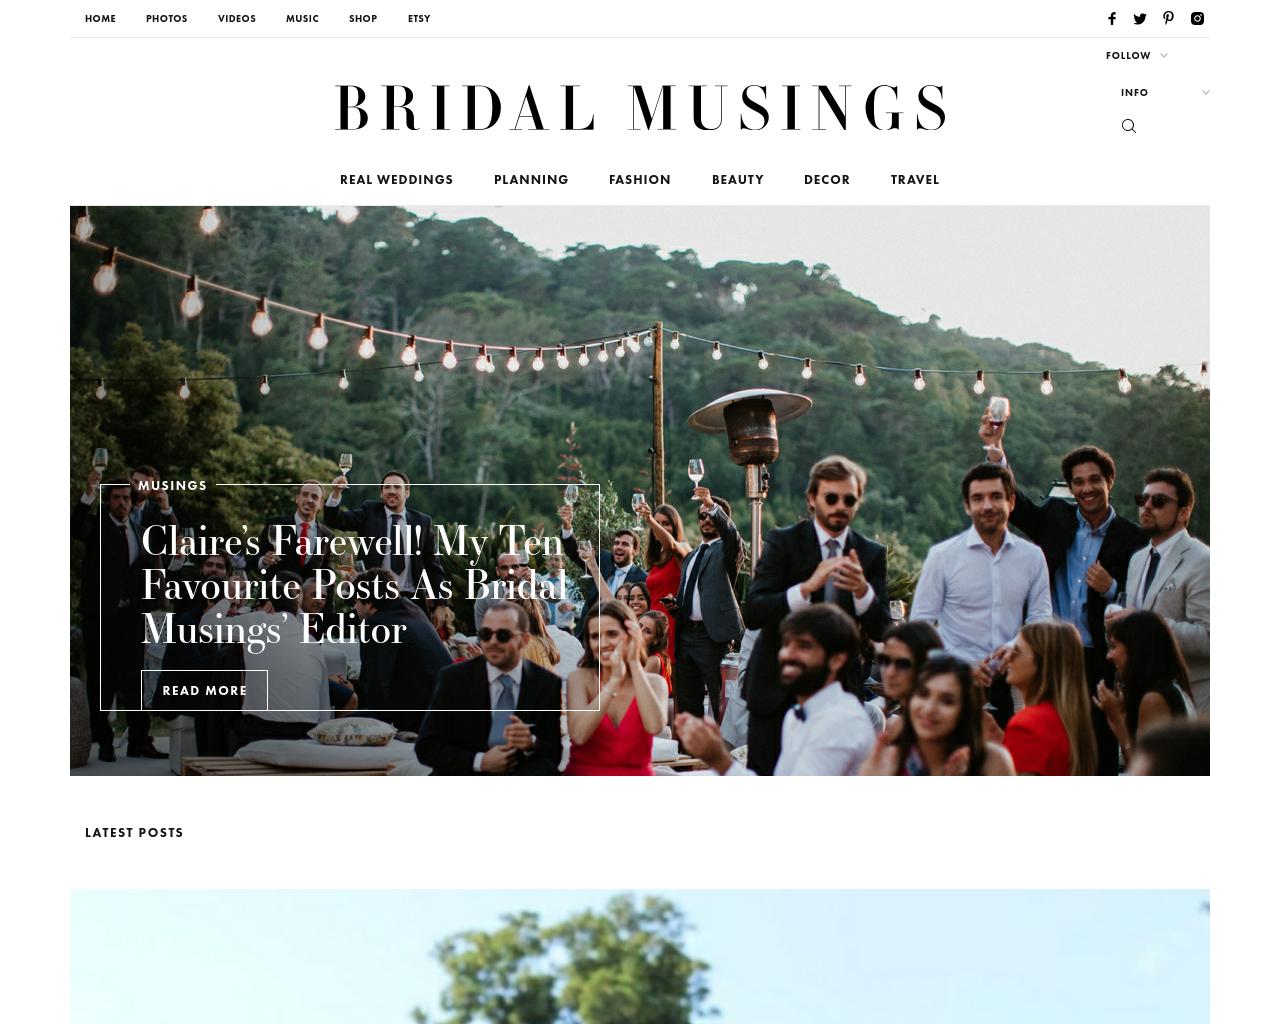 Bridal-Musings-Advertising-Reviews-Pricing